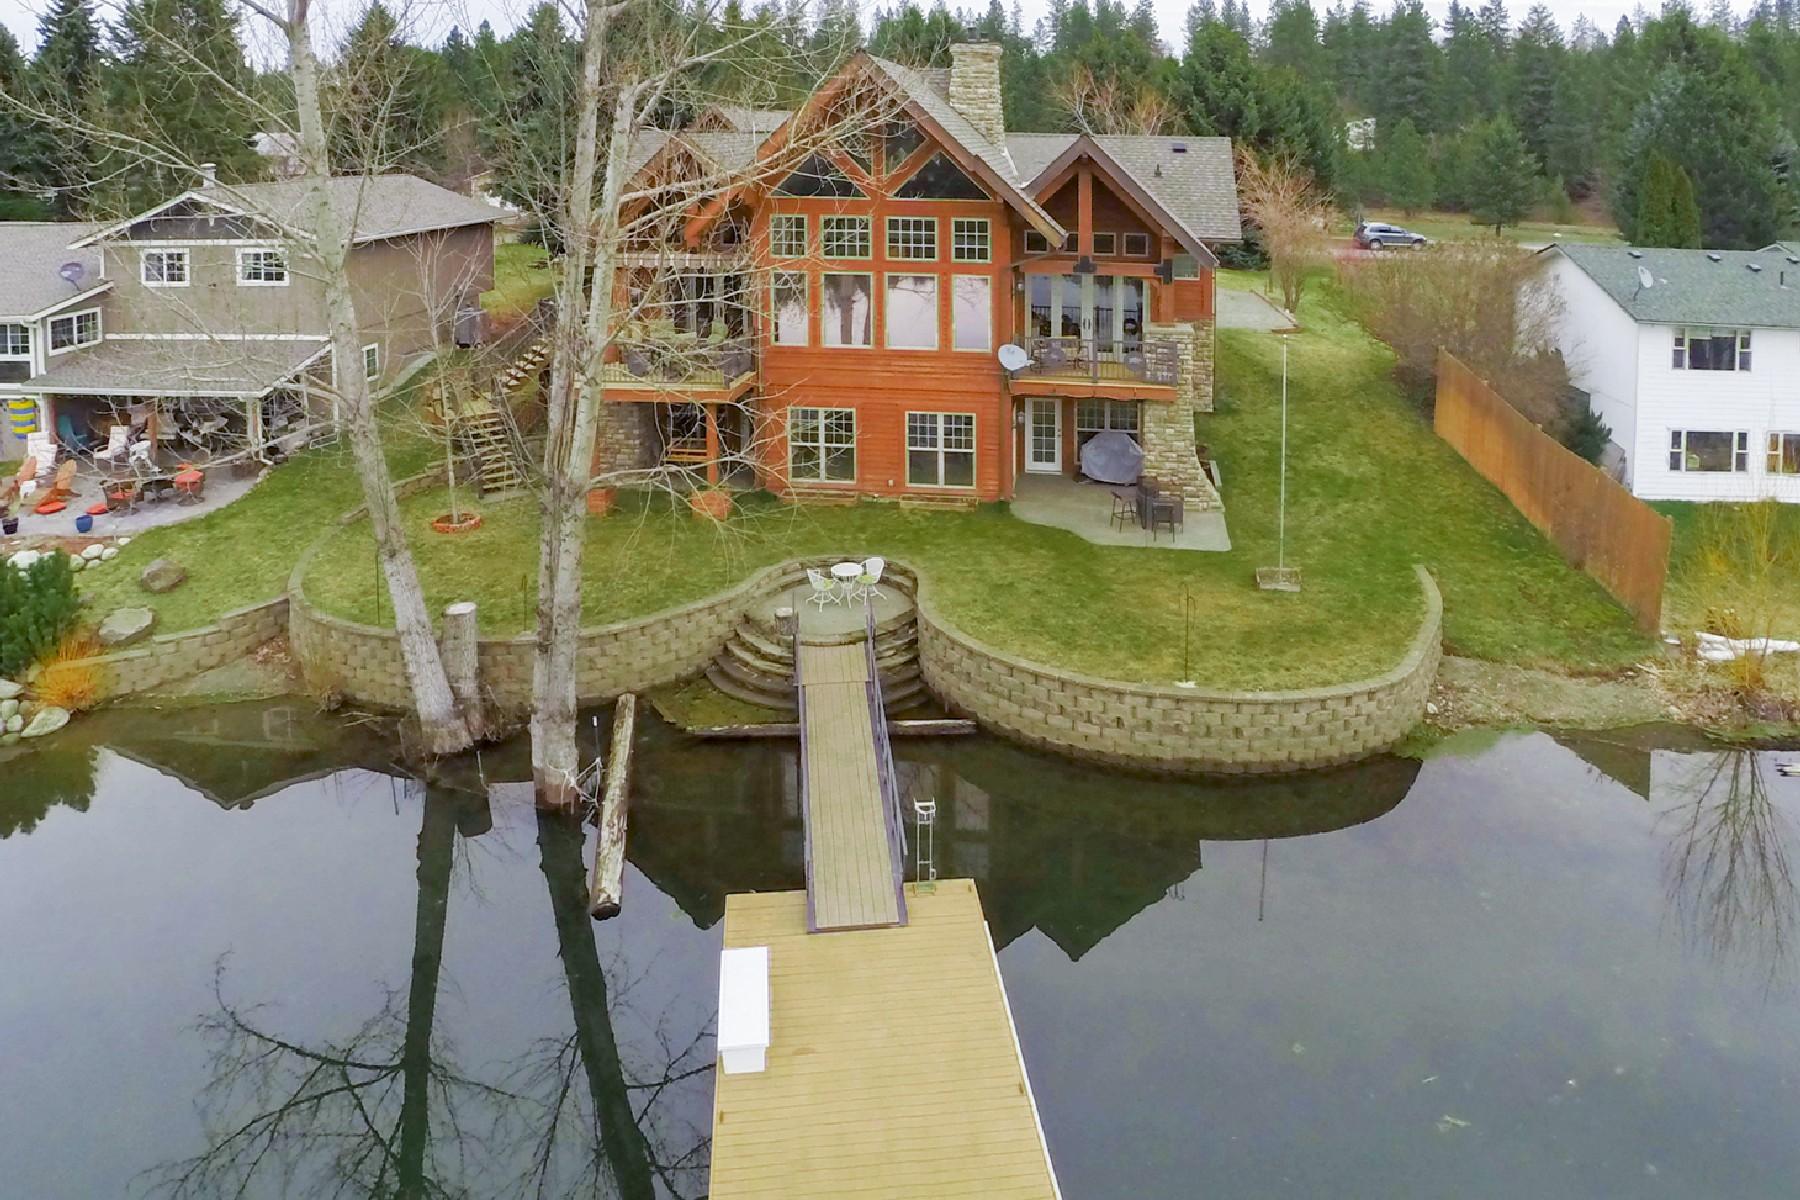 Single Family Home for Active at 6706 Salishan Way, Spirit Lake 6706 W Salishan Way Spirit Lake, Idaho 83869 United States